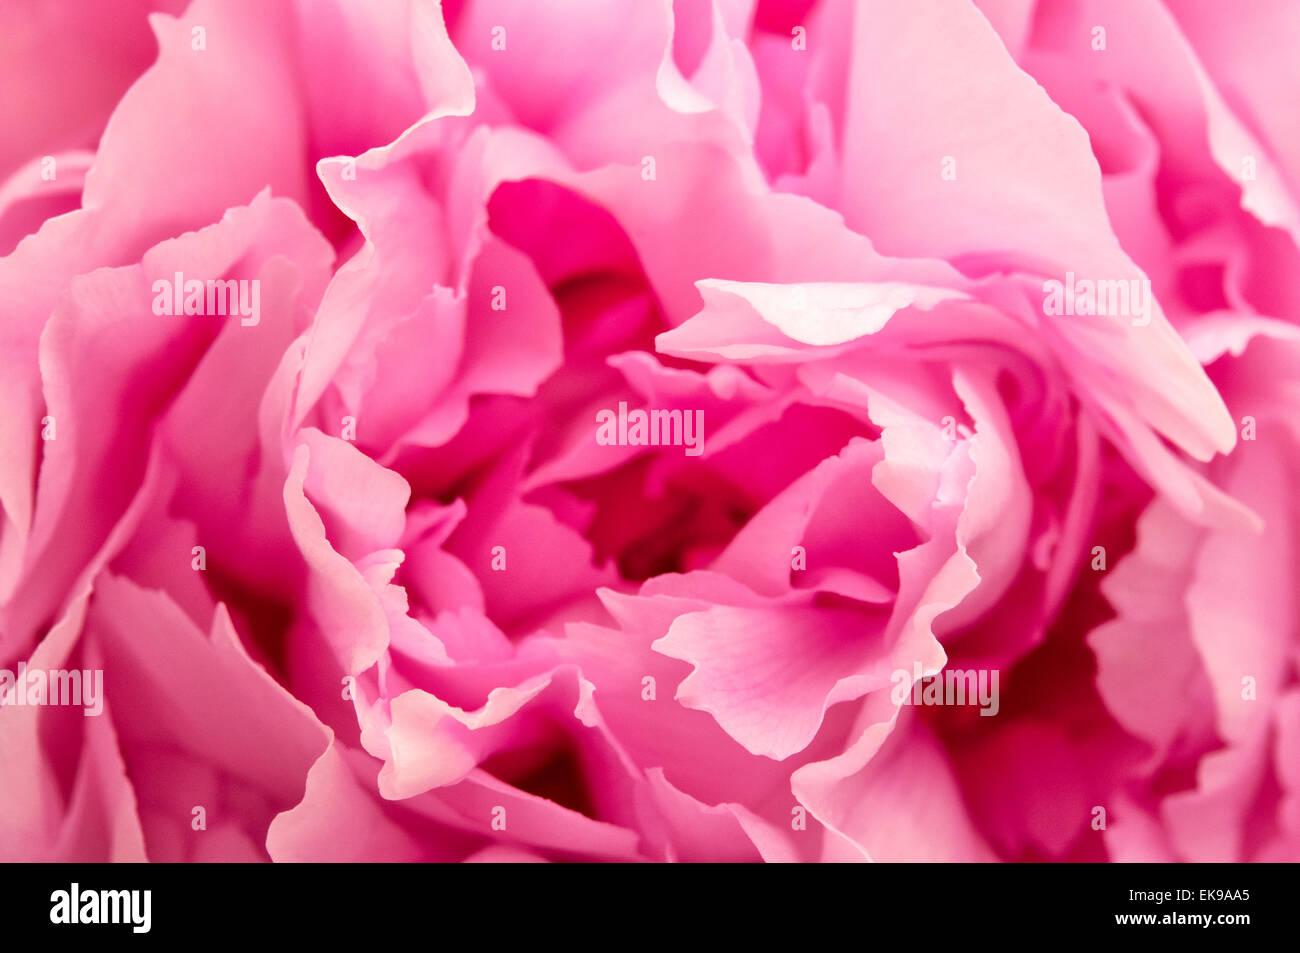 Gros plan d'une pivoine Rose Photo Stock